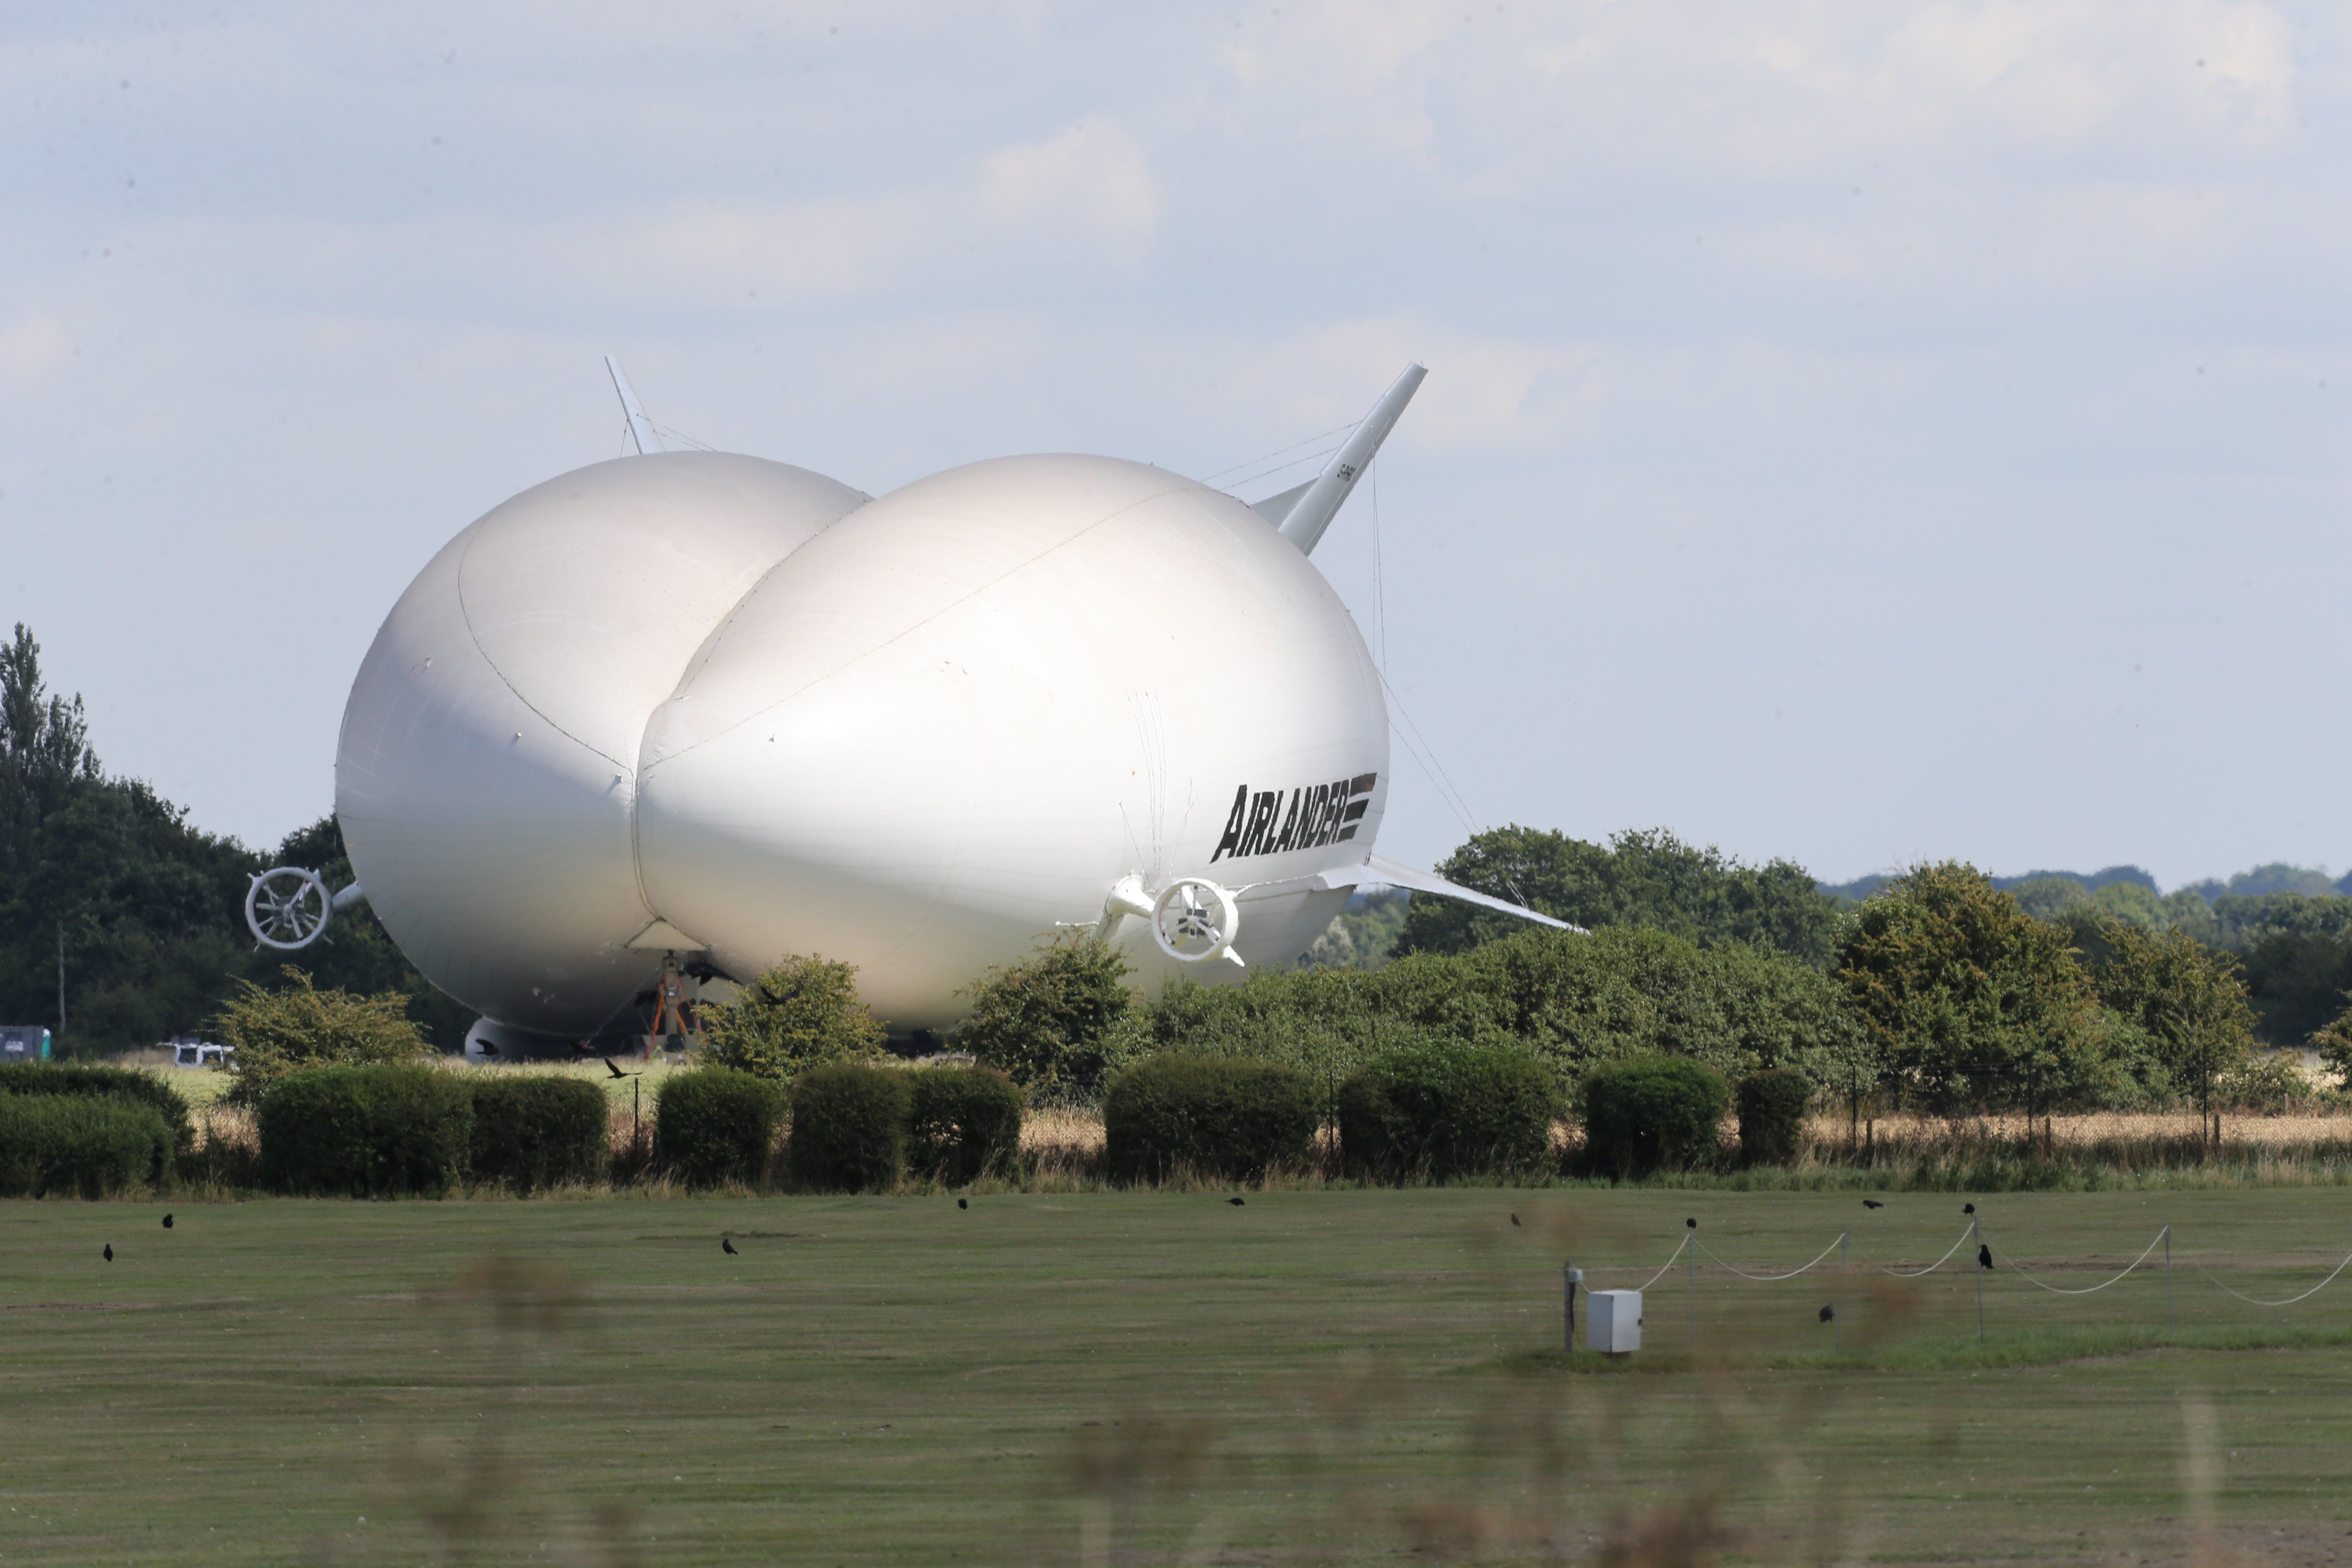 World's Longest Aircraft Looks Like A Giant Flying